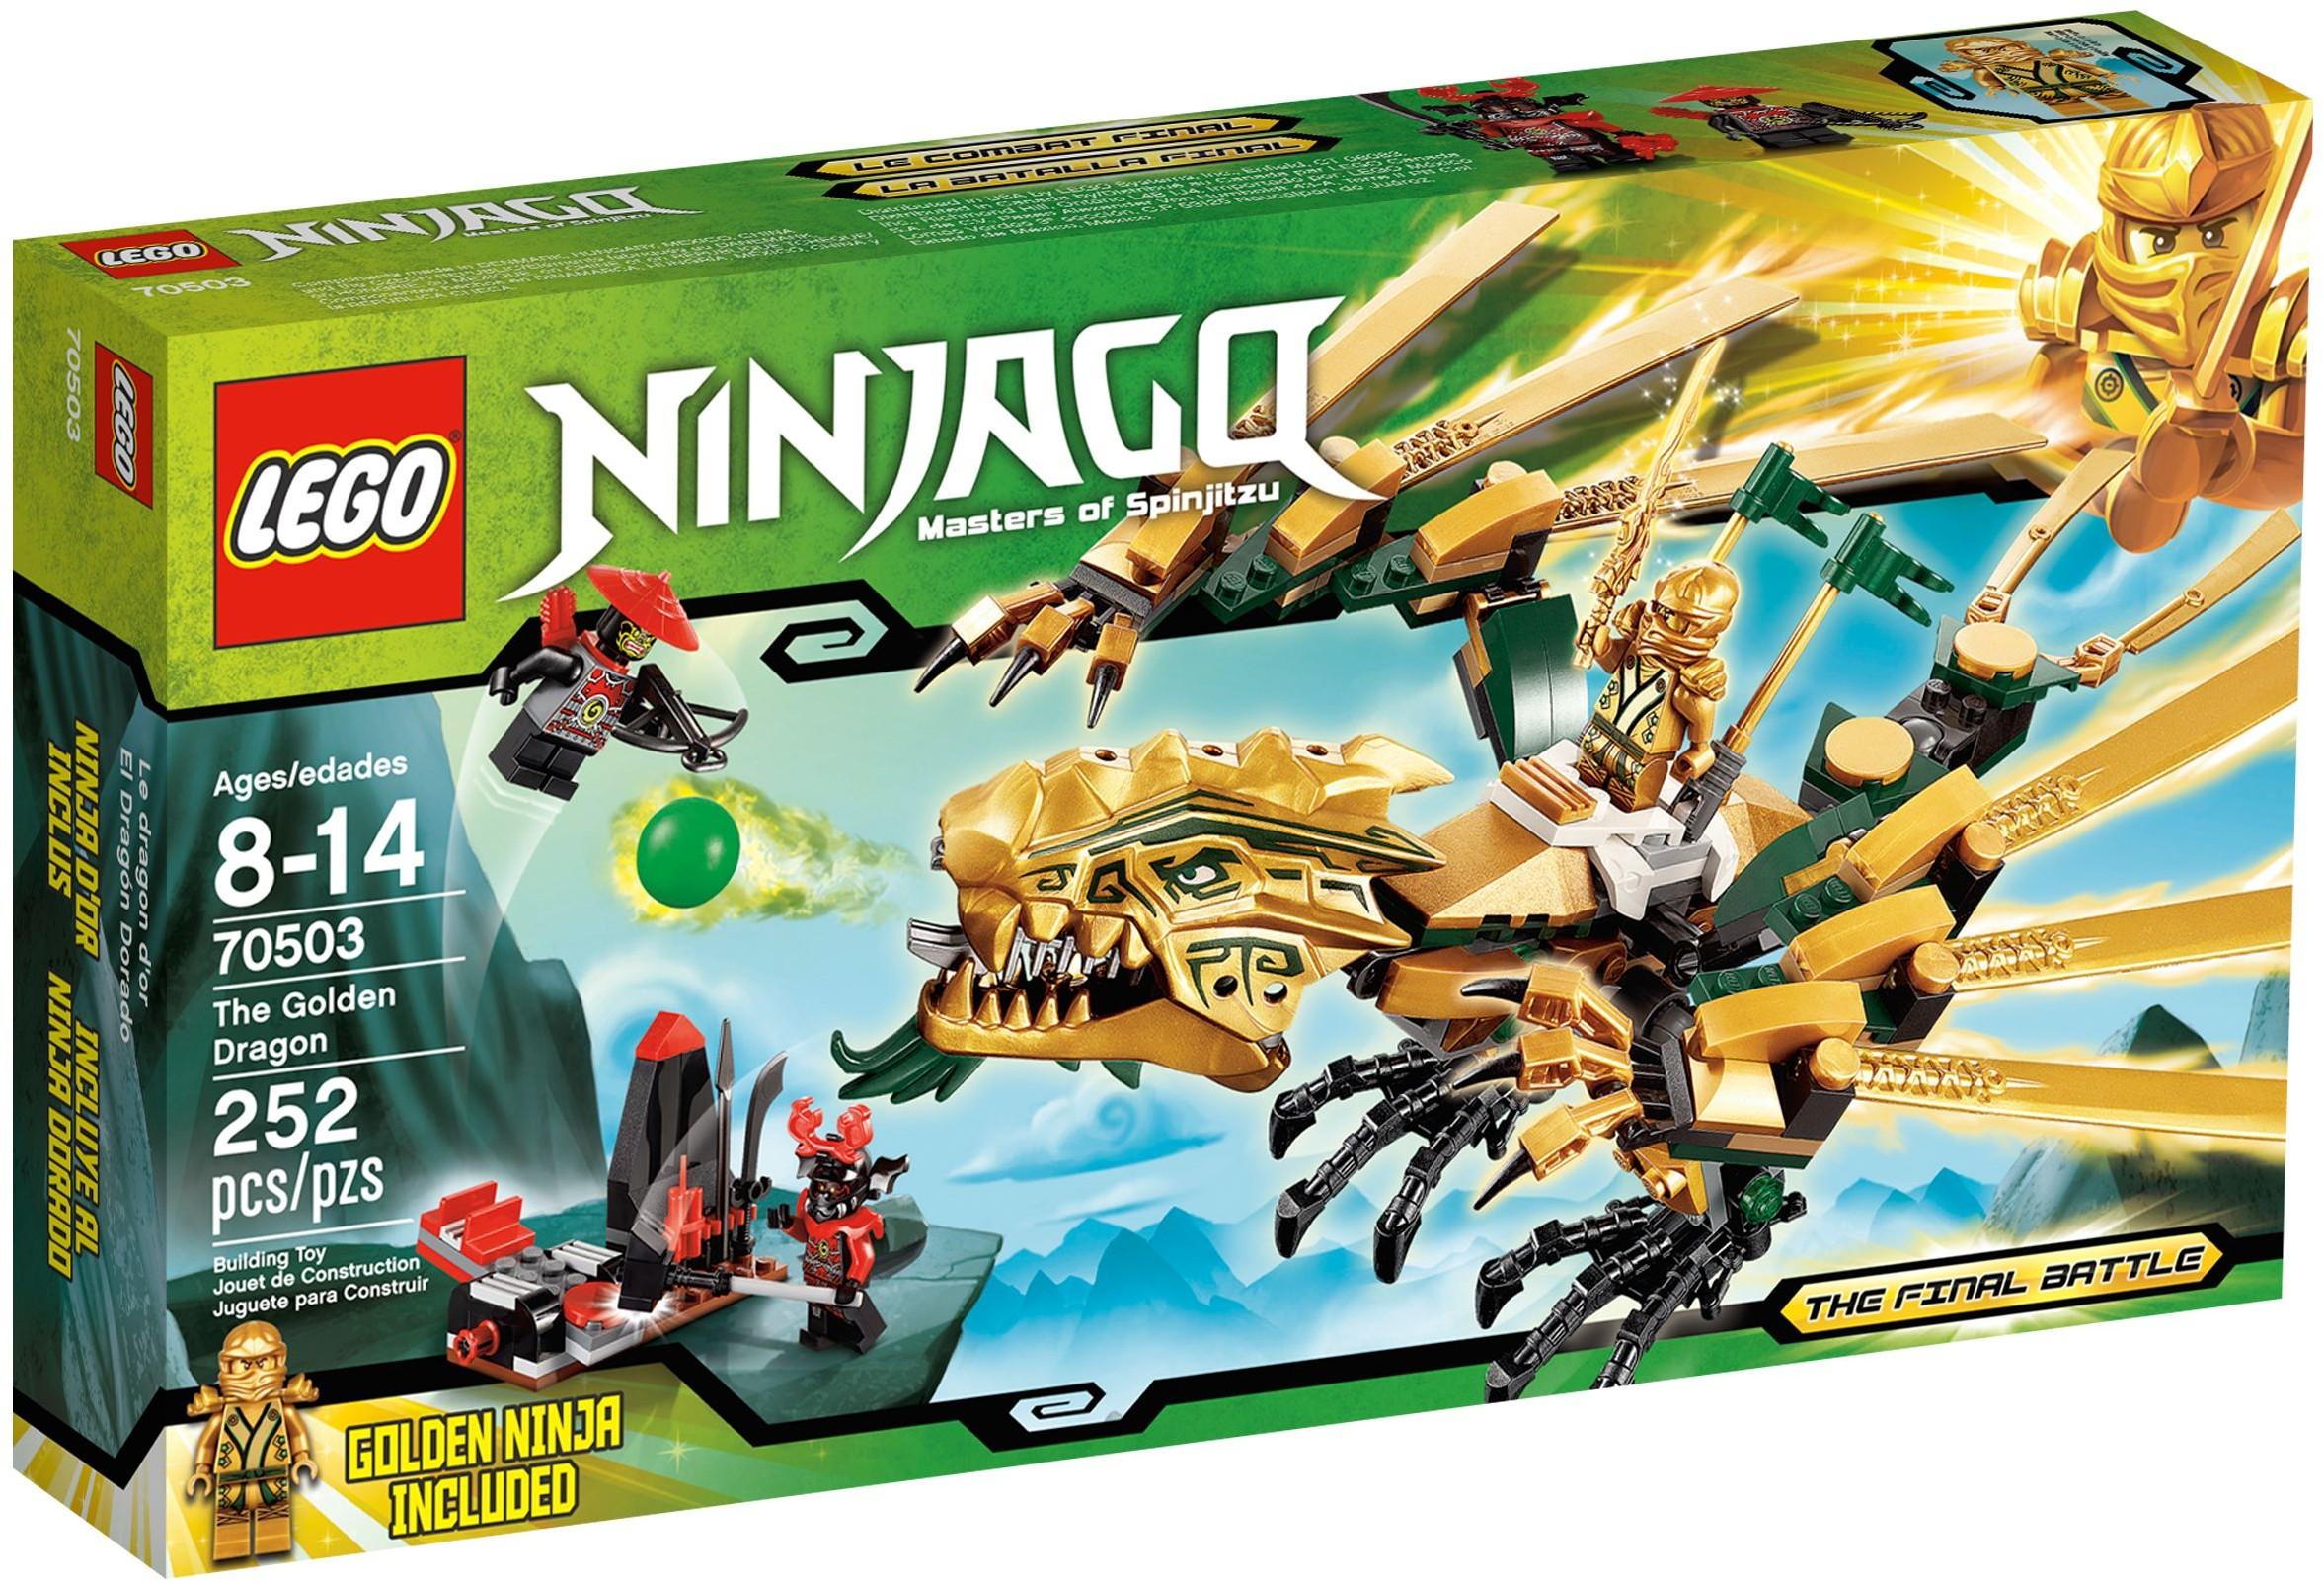 lego ninjago 70503 pas cher le dragon d 39 or. Black Bedroom Furniture Sets. Home Design Ideas